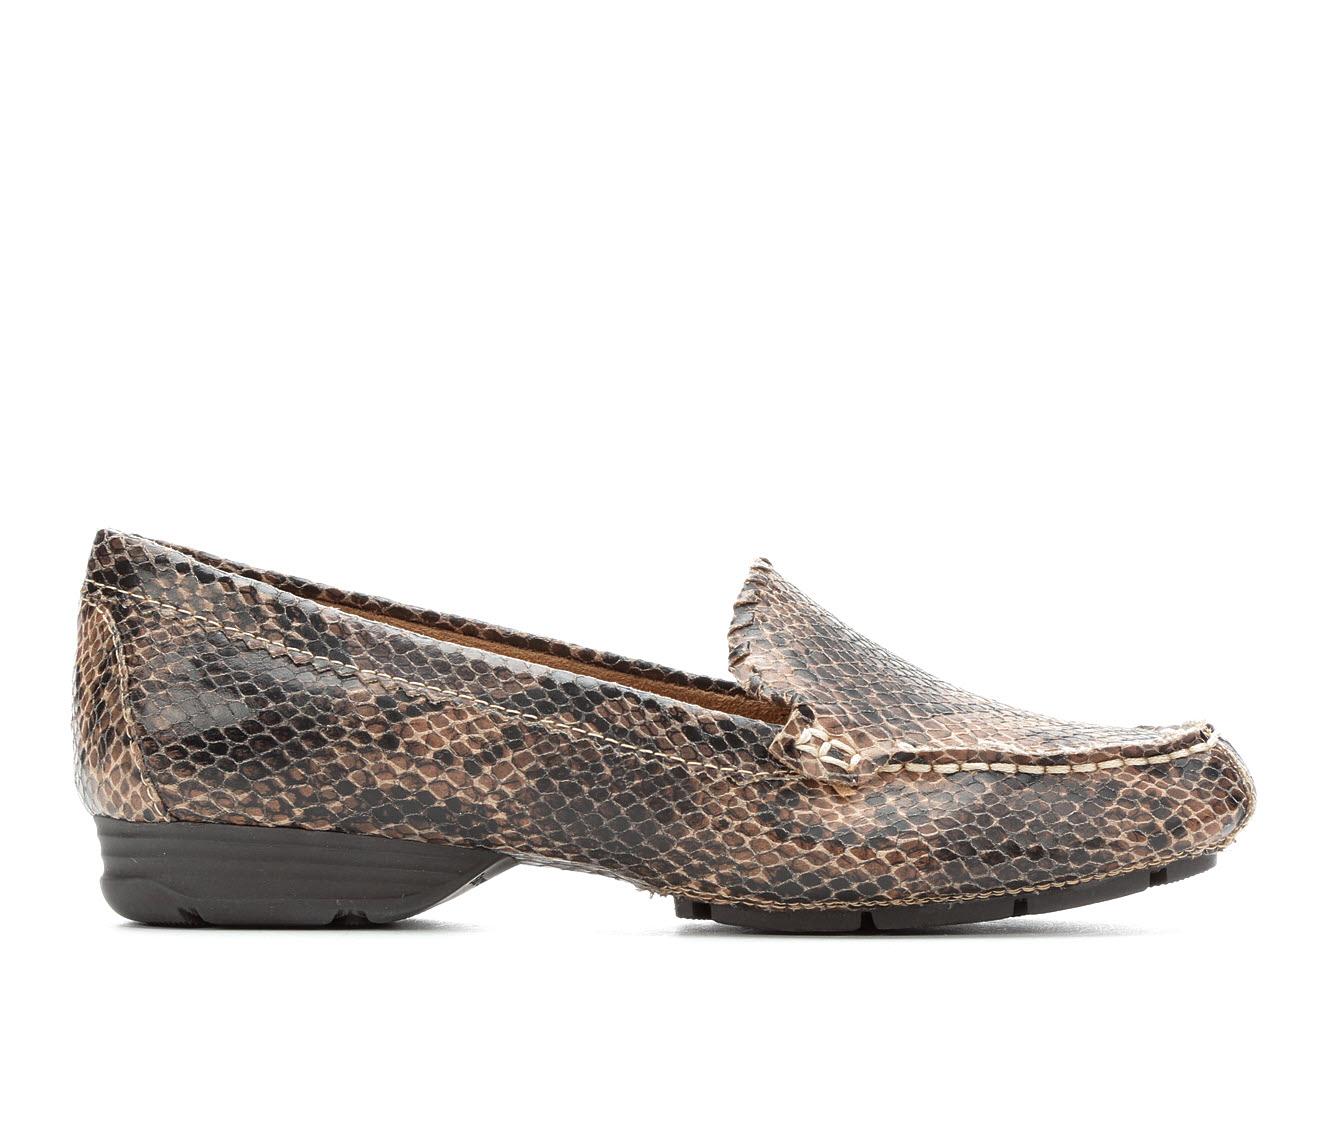 Baretraps Ownah Women's Shoe (Brown Faux Leather)